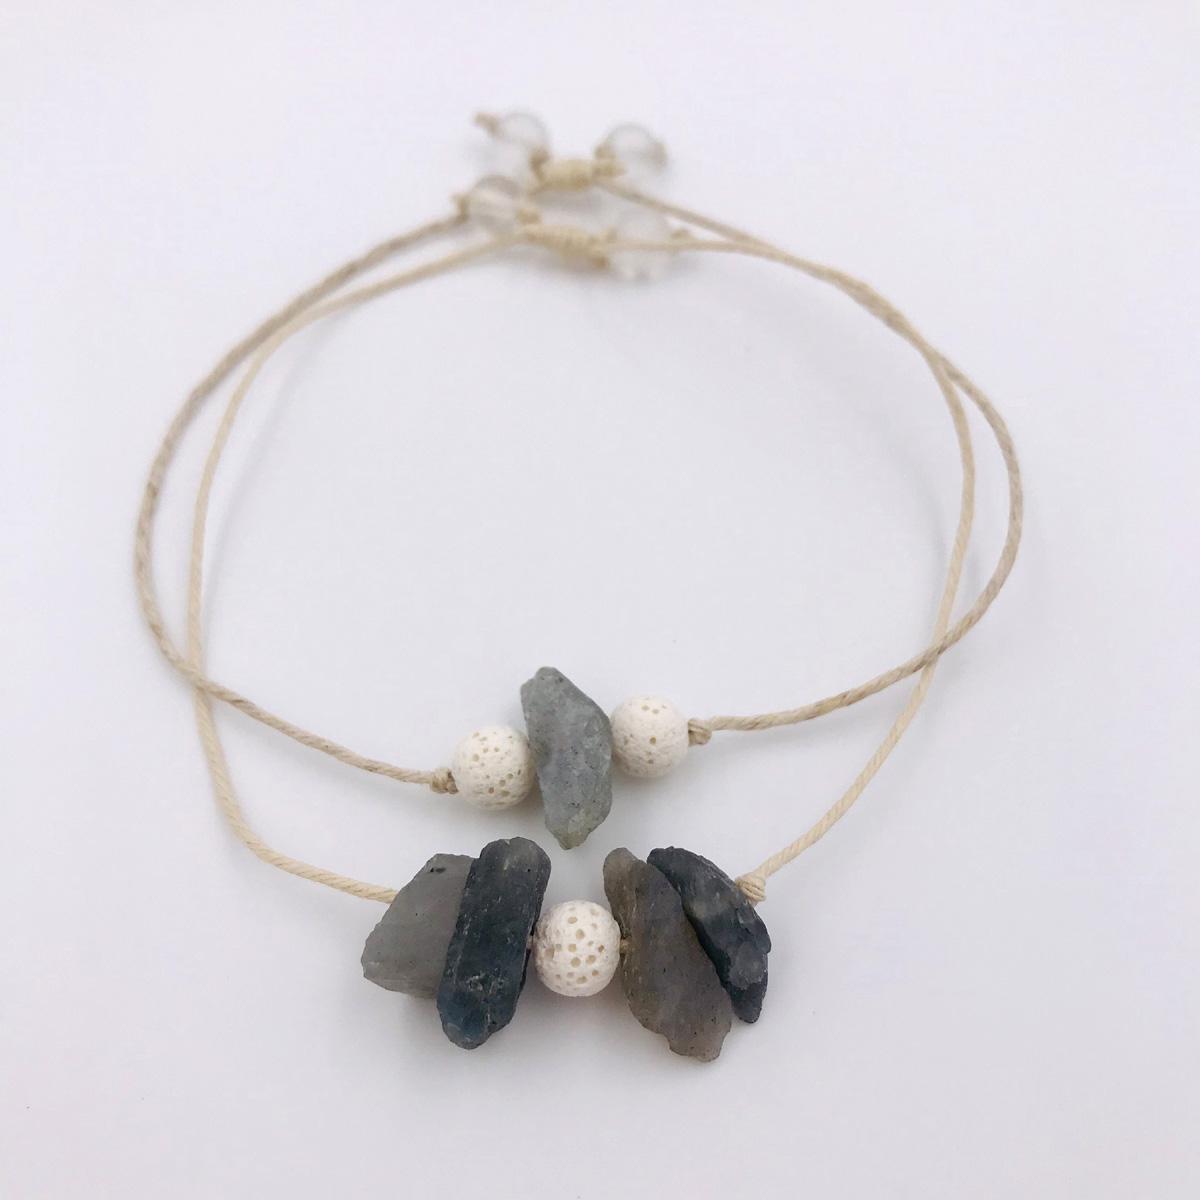 Labradorite Aromatherapy Bracelets